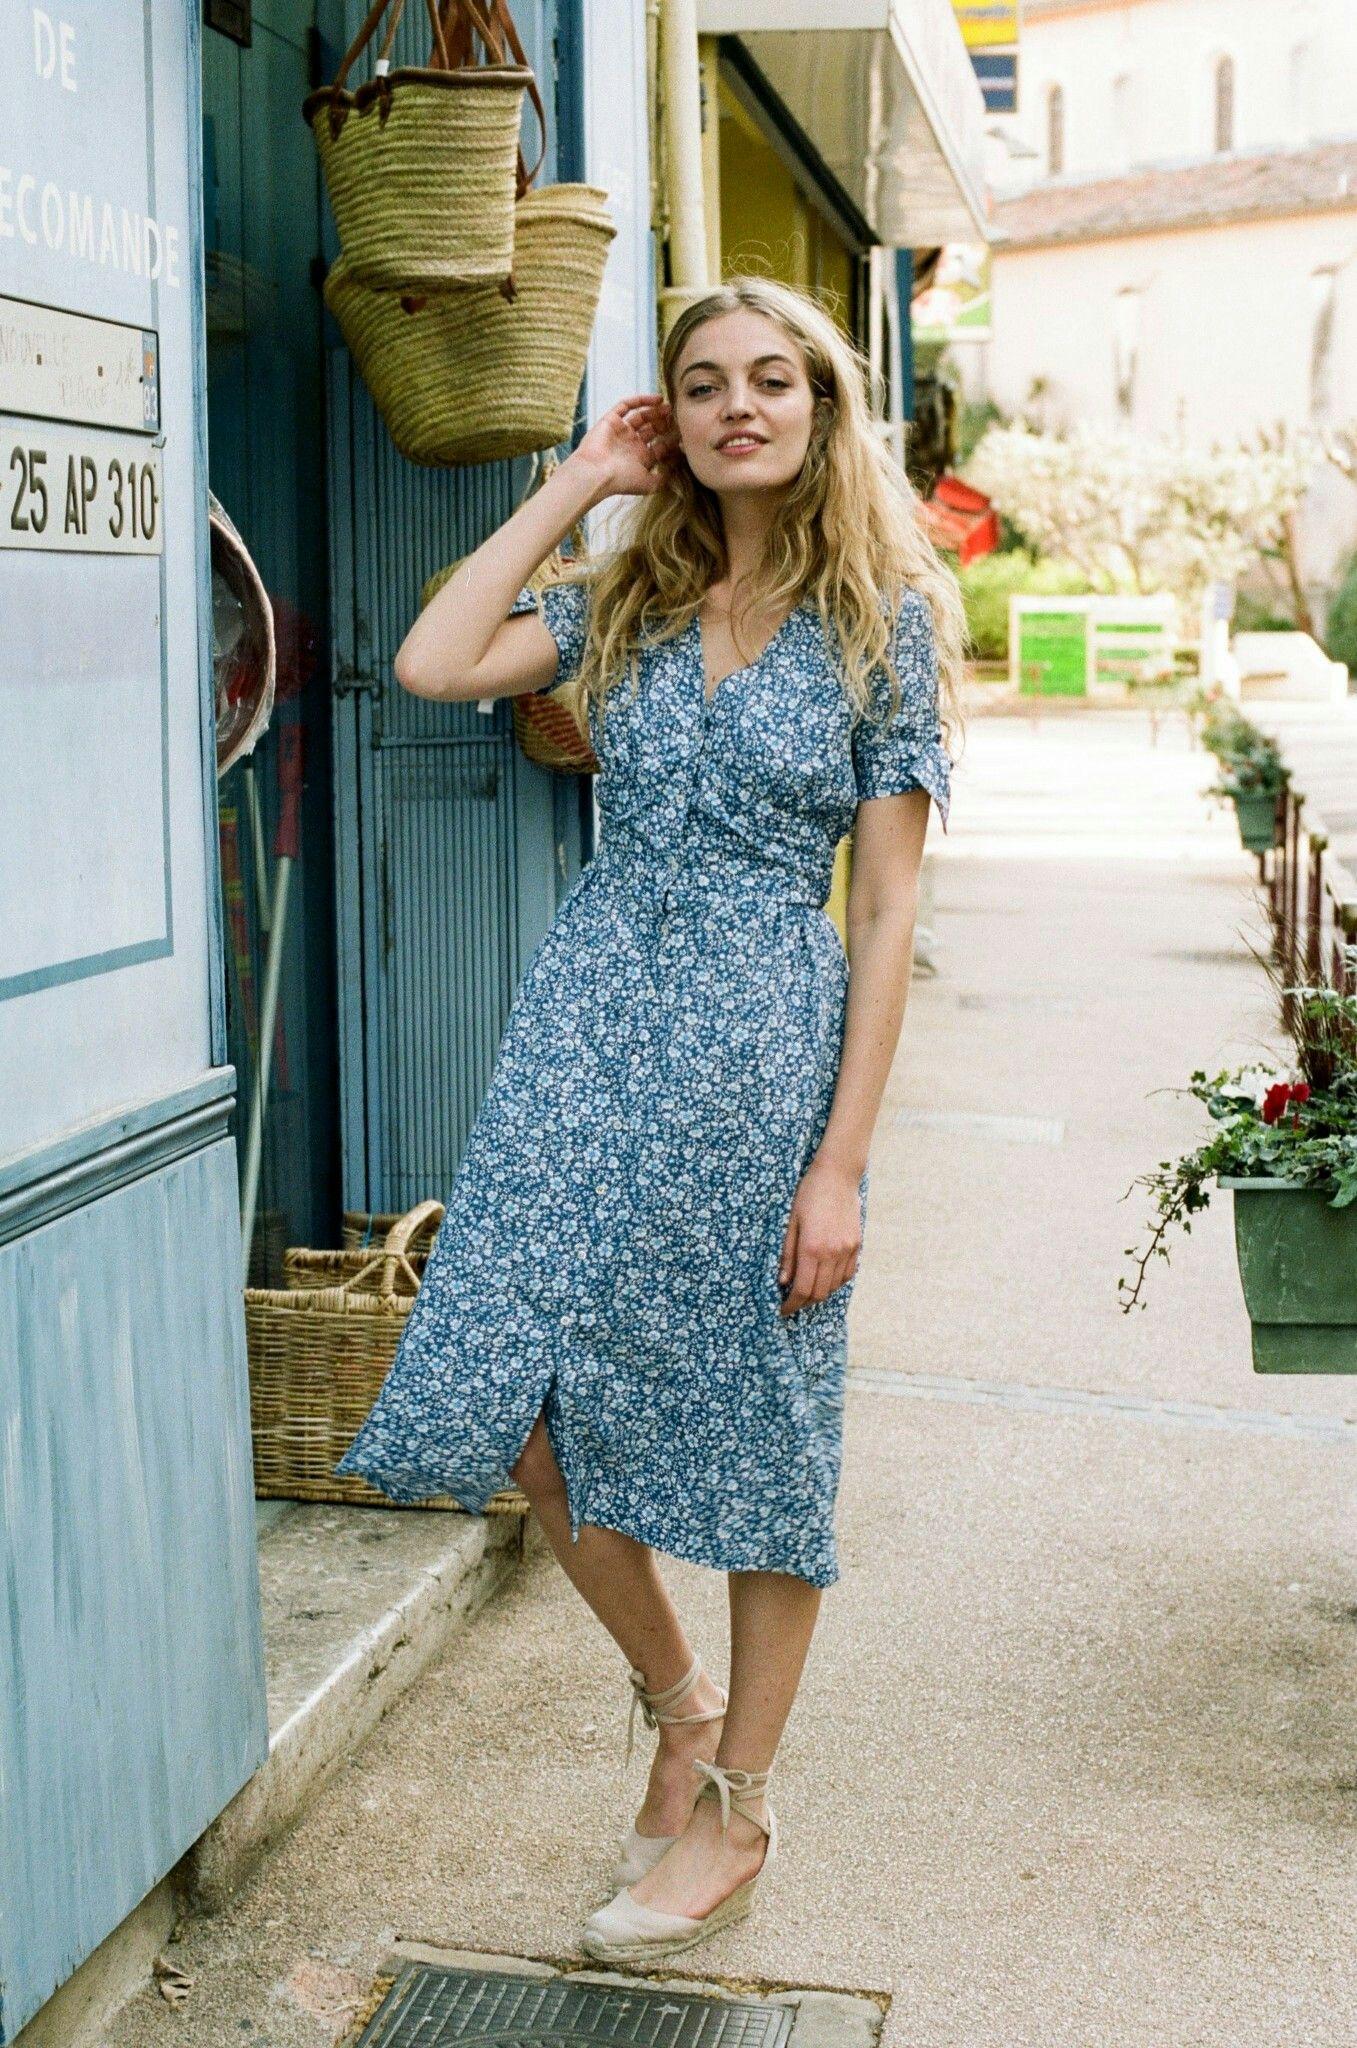 Ways to Wear Tea Dresses Fashionably